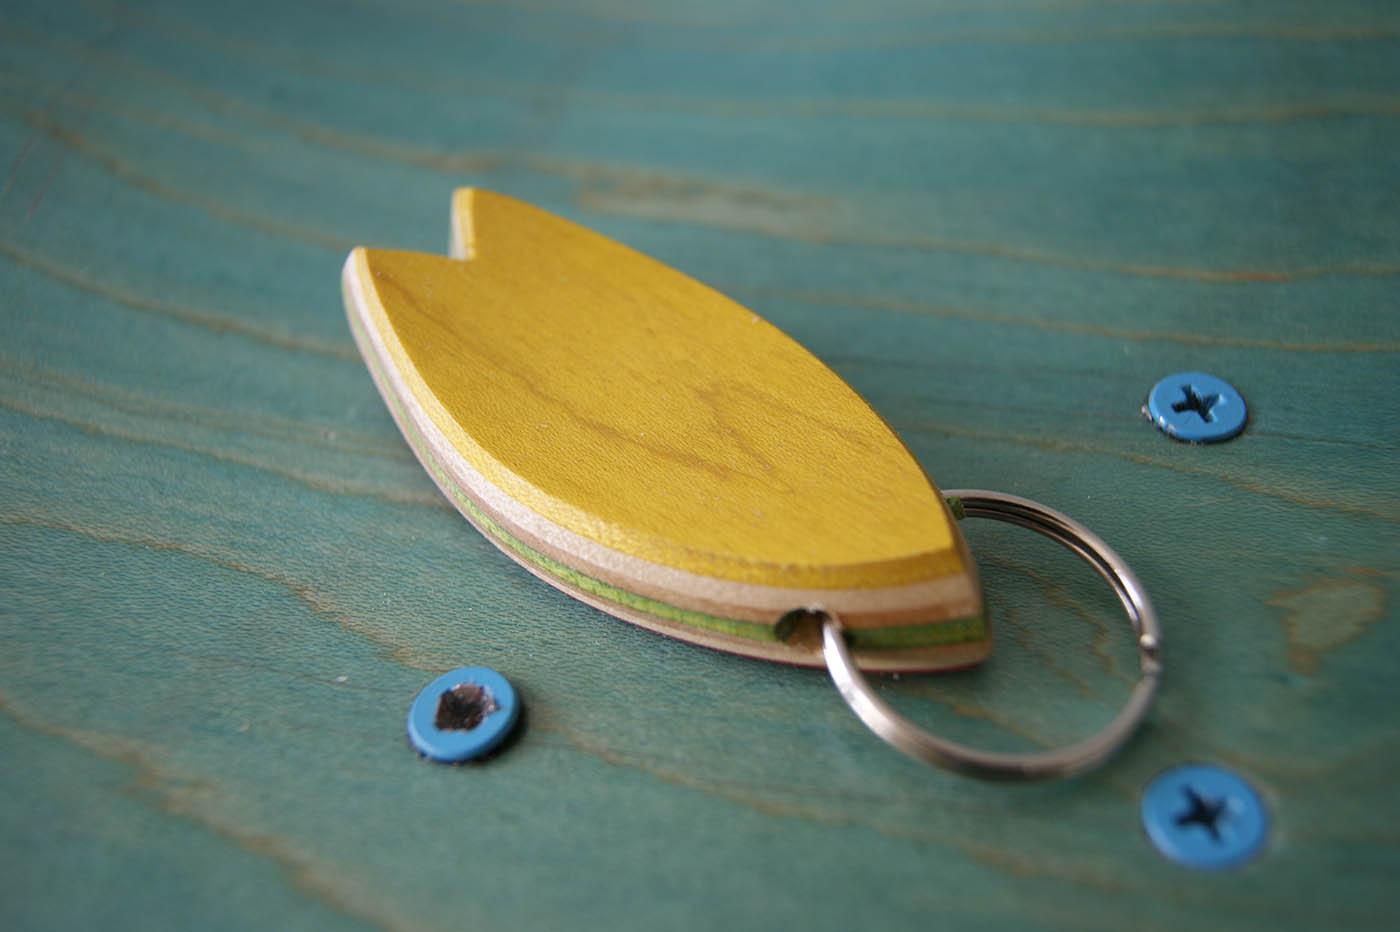 5-Skatan-LLC-Surfboard-Key-Chain-Skateboarding-Upcycling (55)